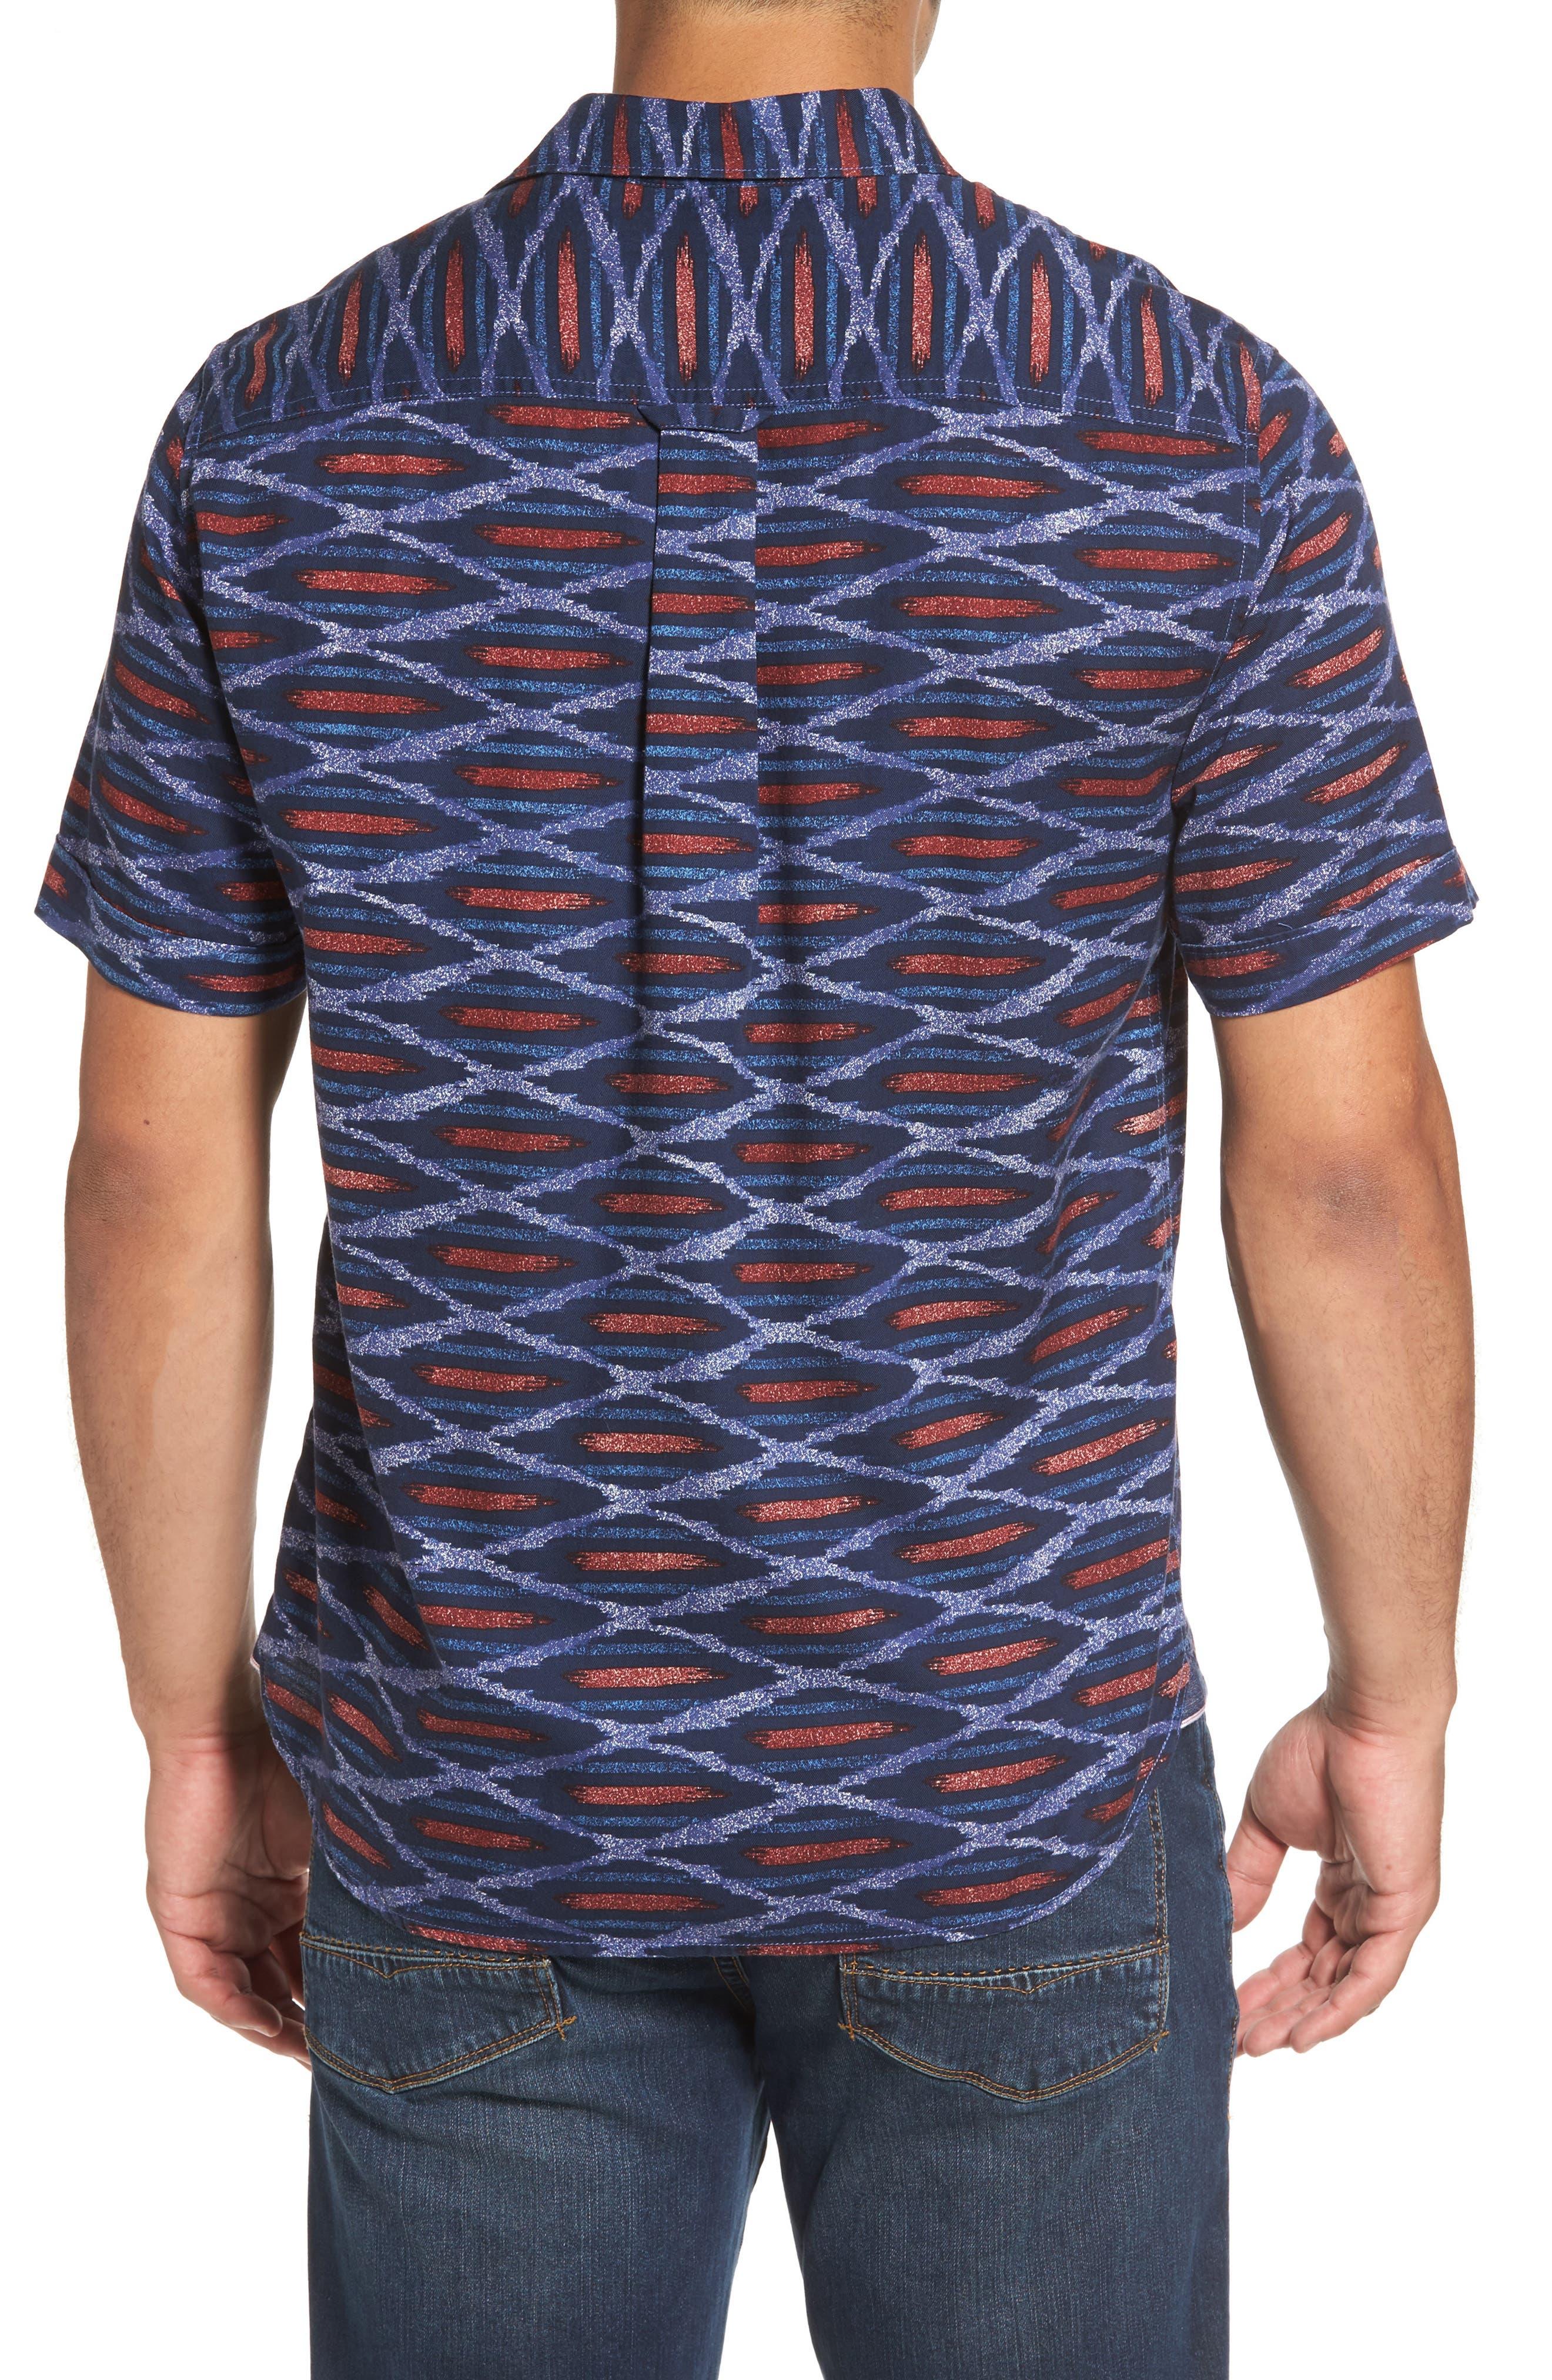 Alternate Image 2  - Tommy Bahama Island Ikat Standard Fit Geo Print Woven Shirt